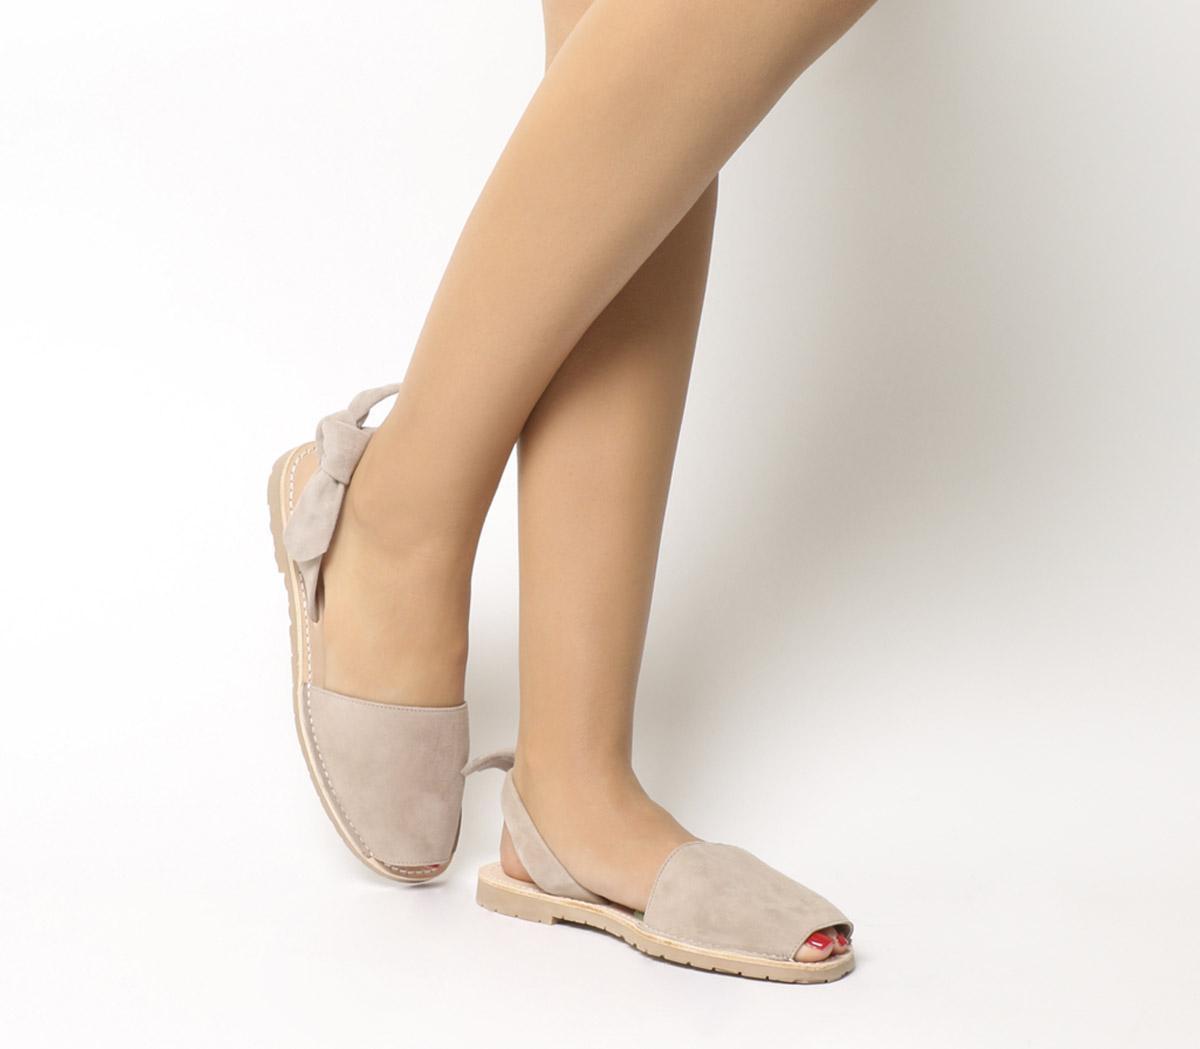 Solillas Bow Sandals